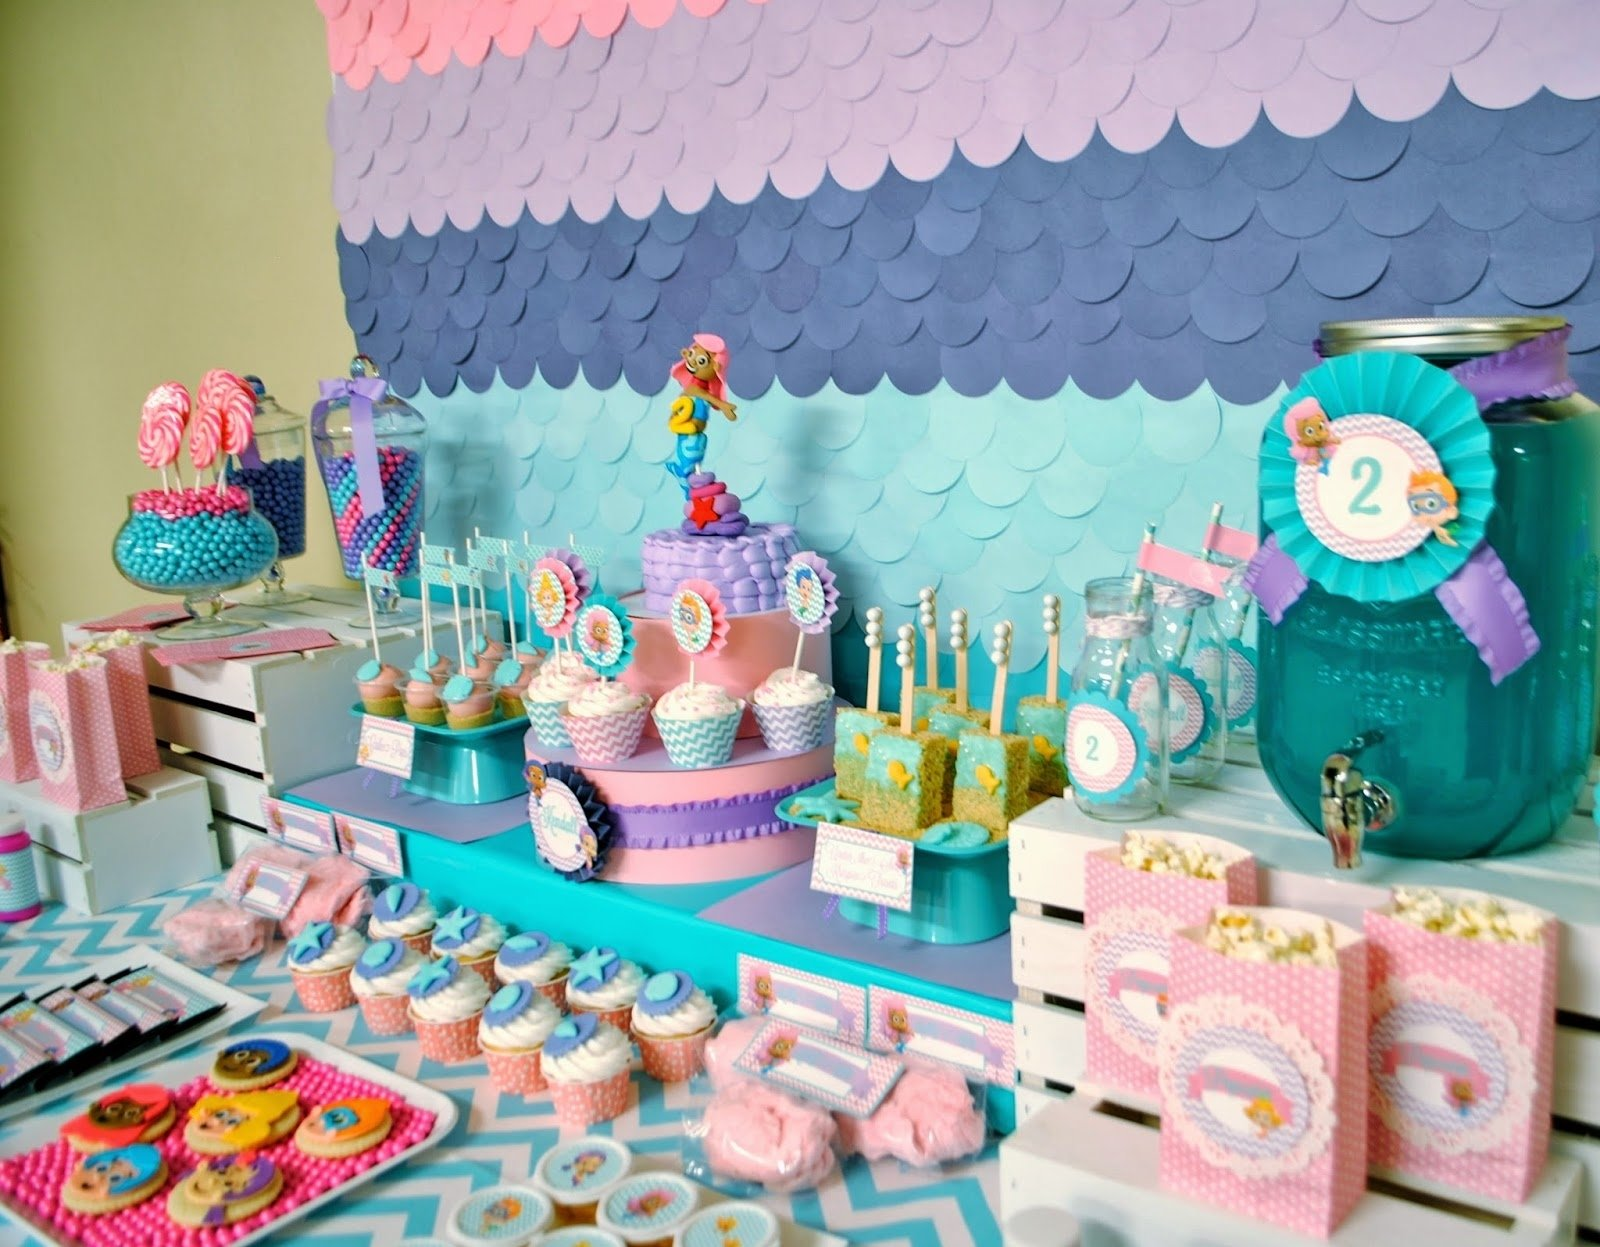 10 Stylish 2Nd Birthday Party Ideas Girl bubble guppies birthday party ideas google search parties 2 2020